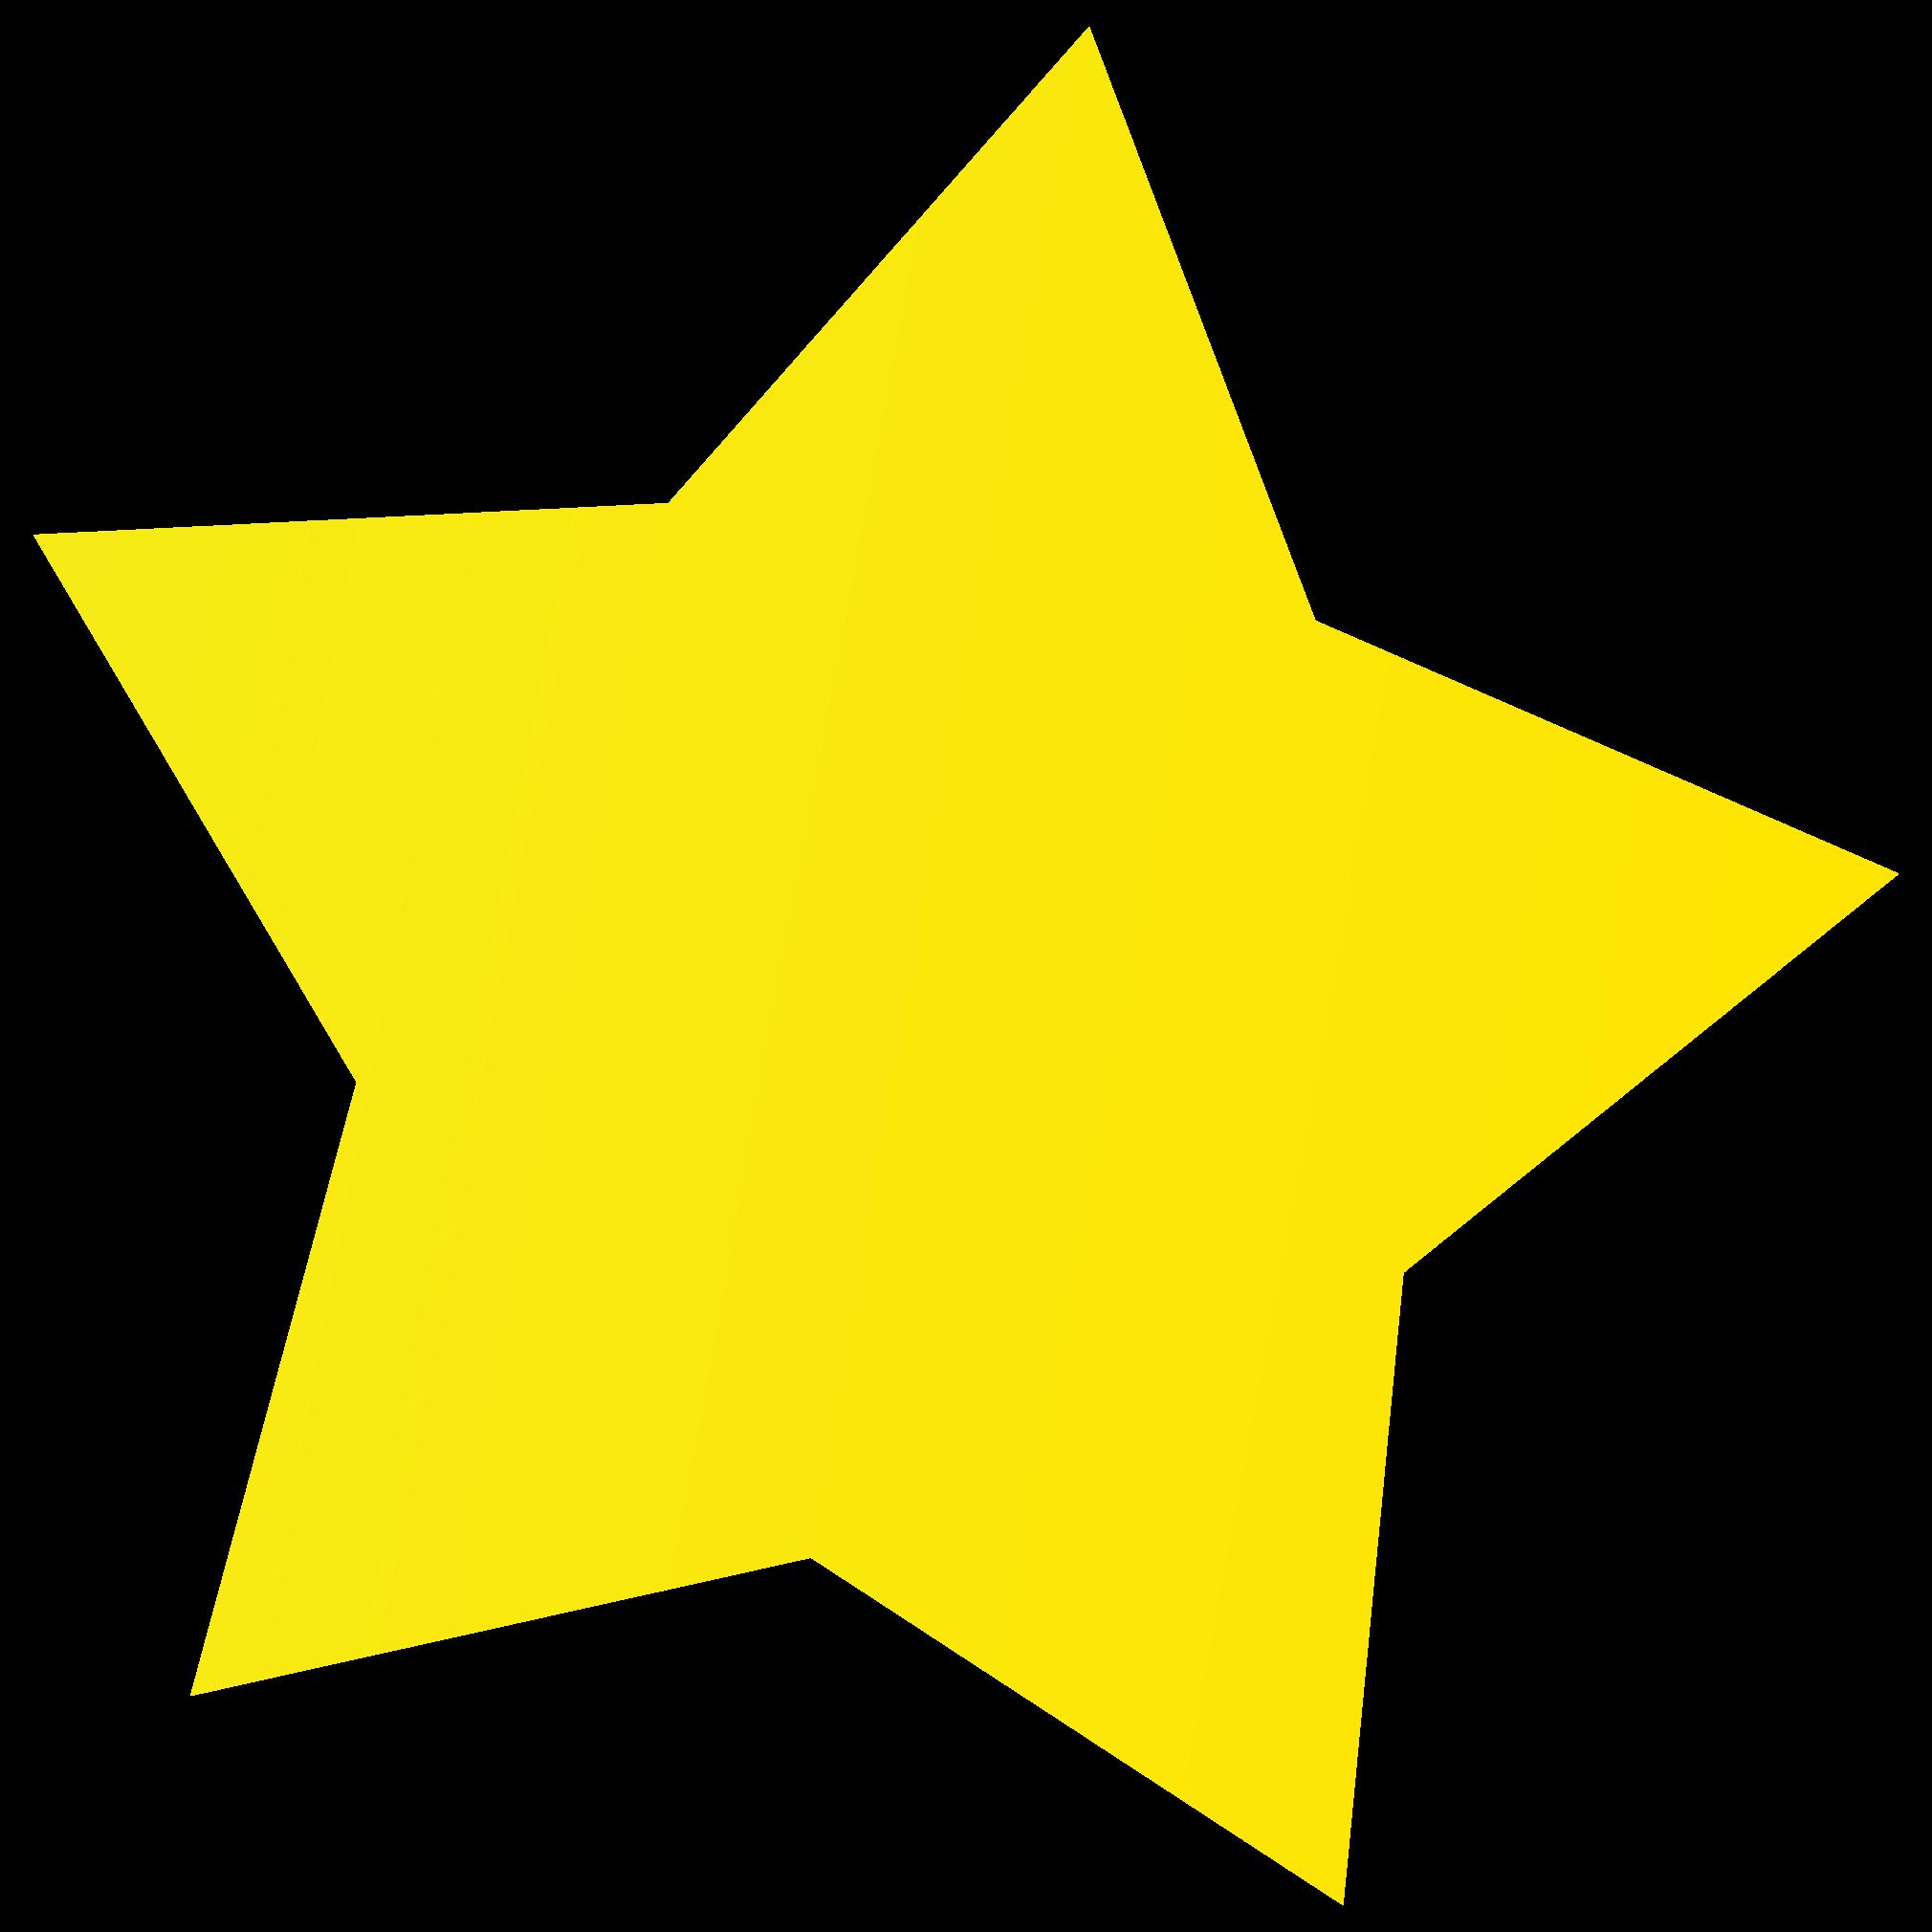 Clip Art Star Png ClipArt Best ?